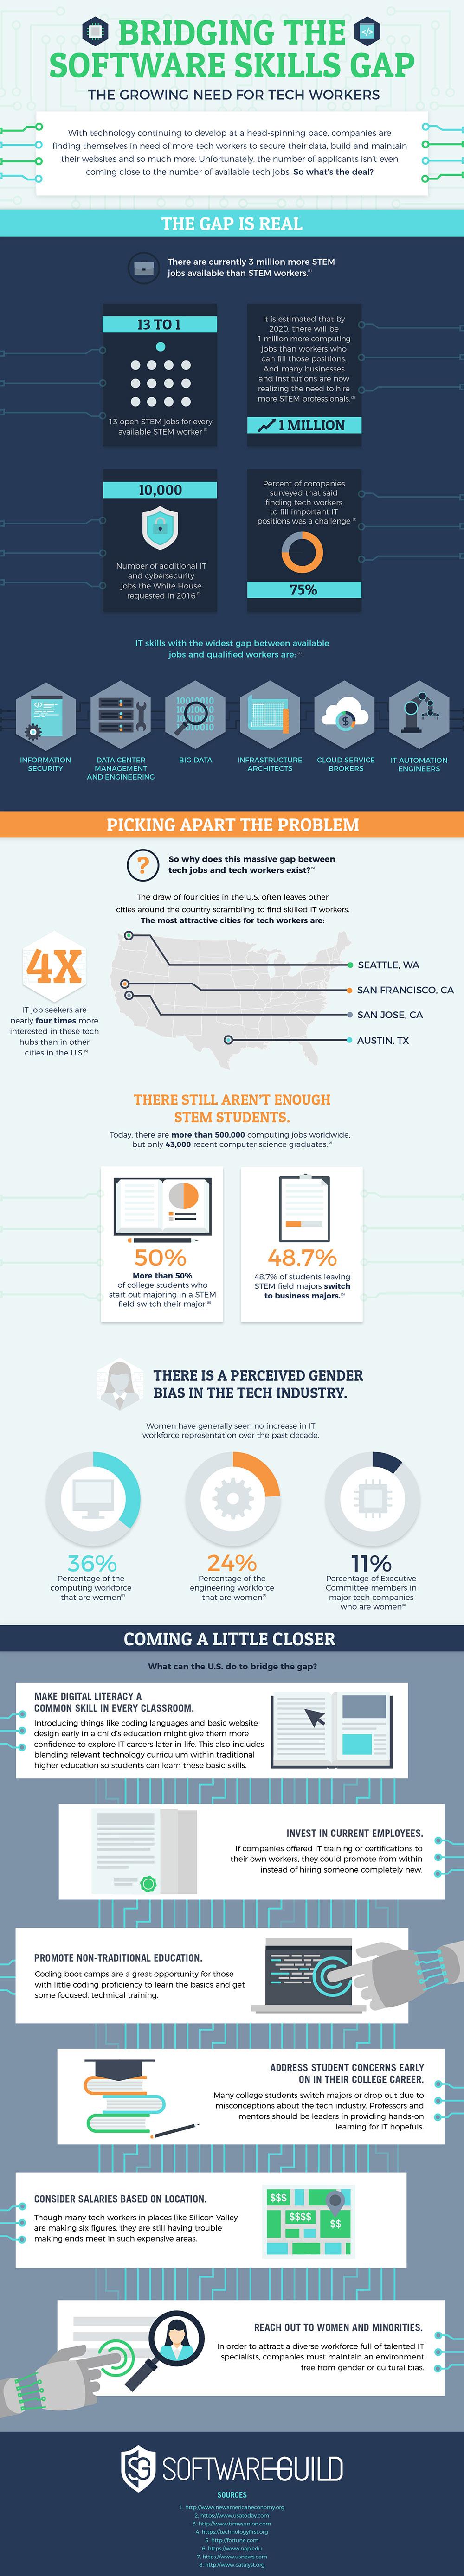 software skills gap